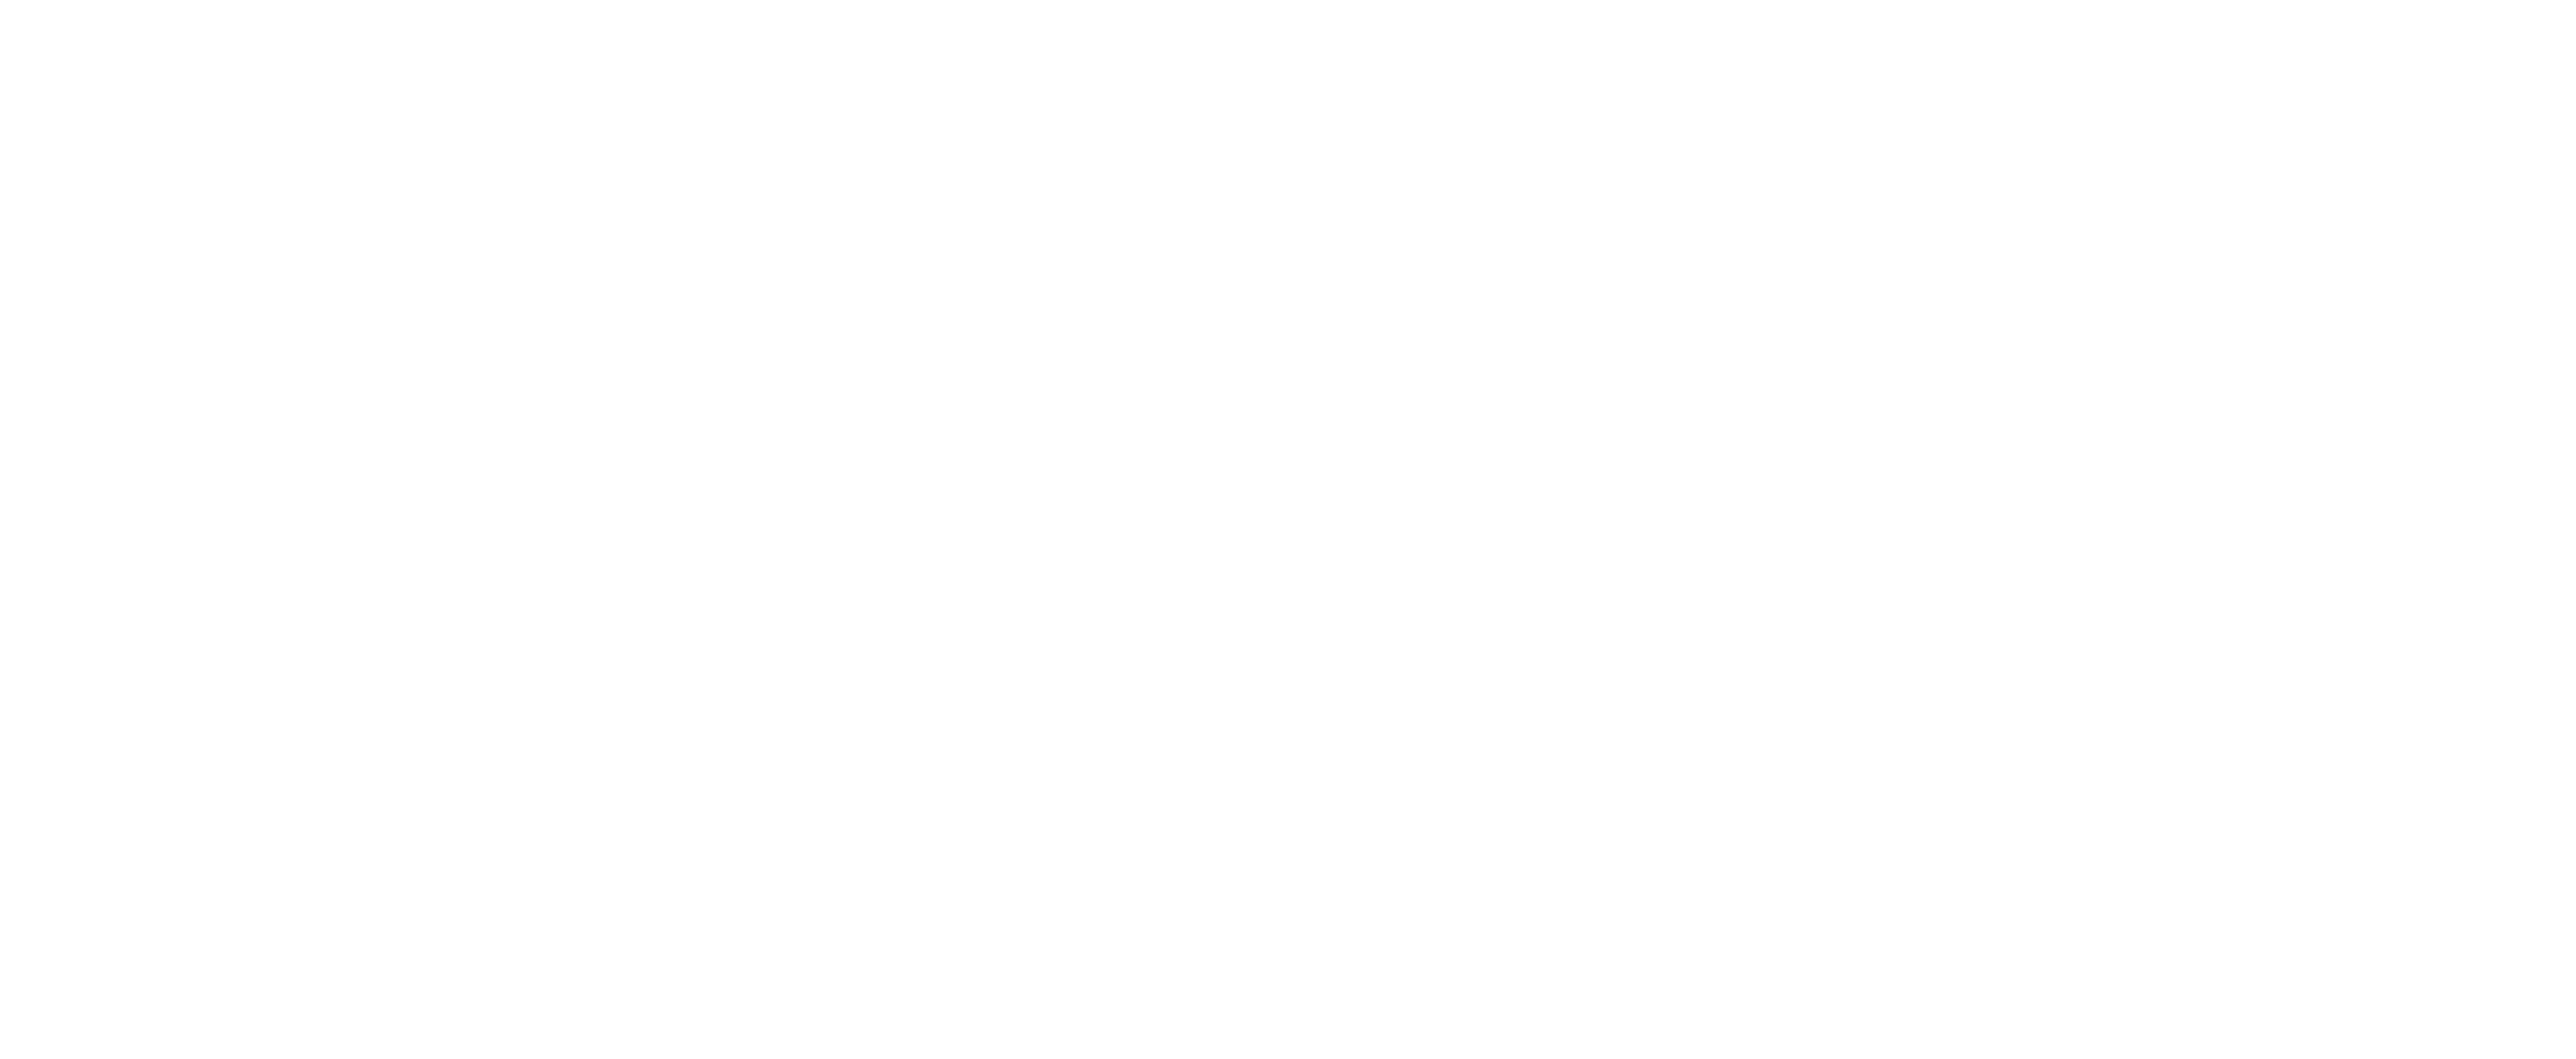 Bio-logo-2_reversesded-copy-1